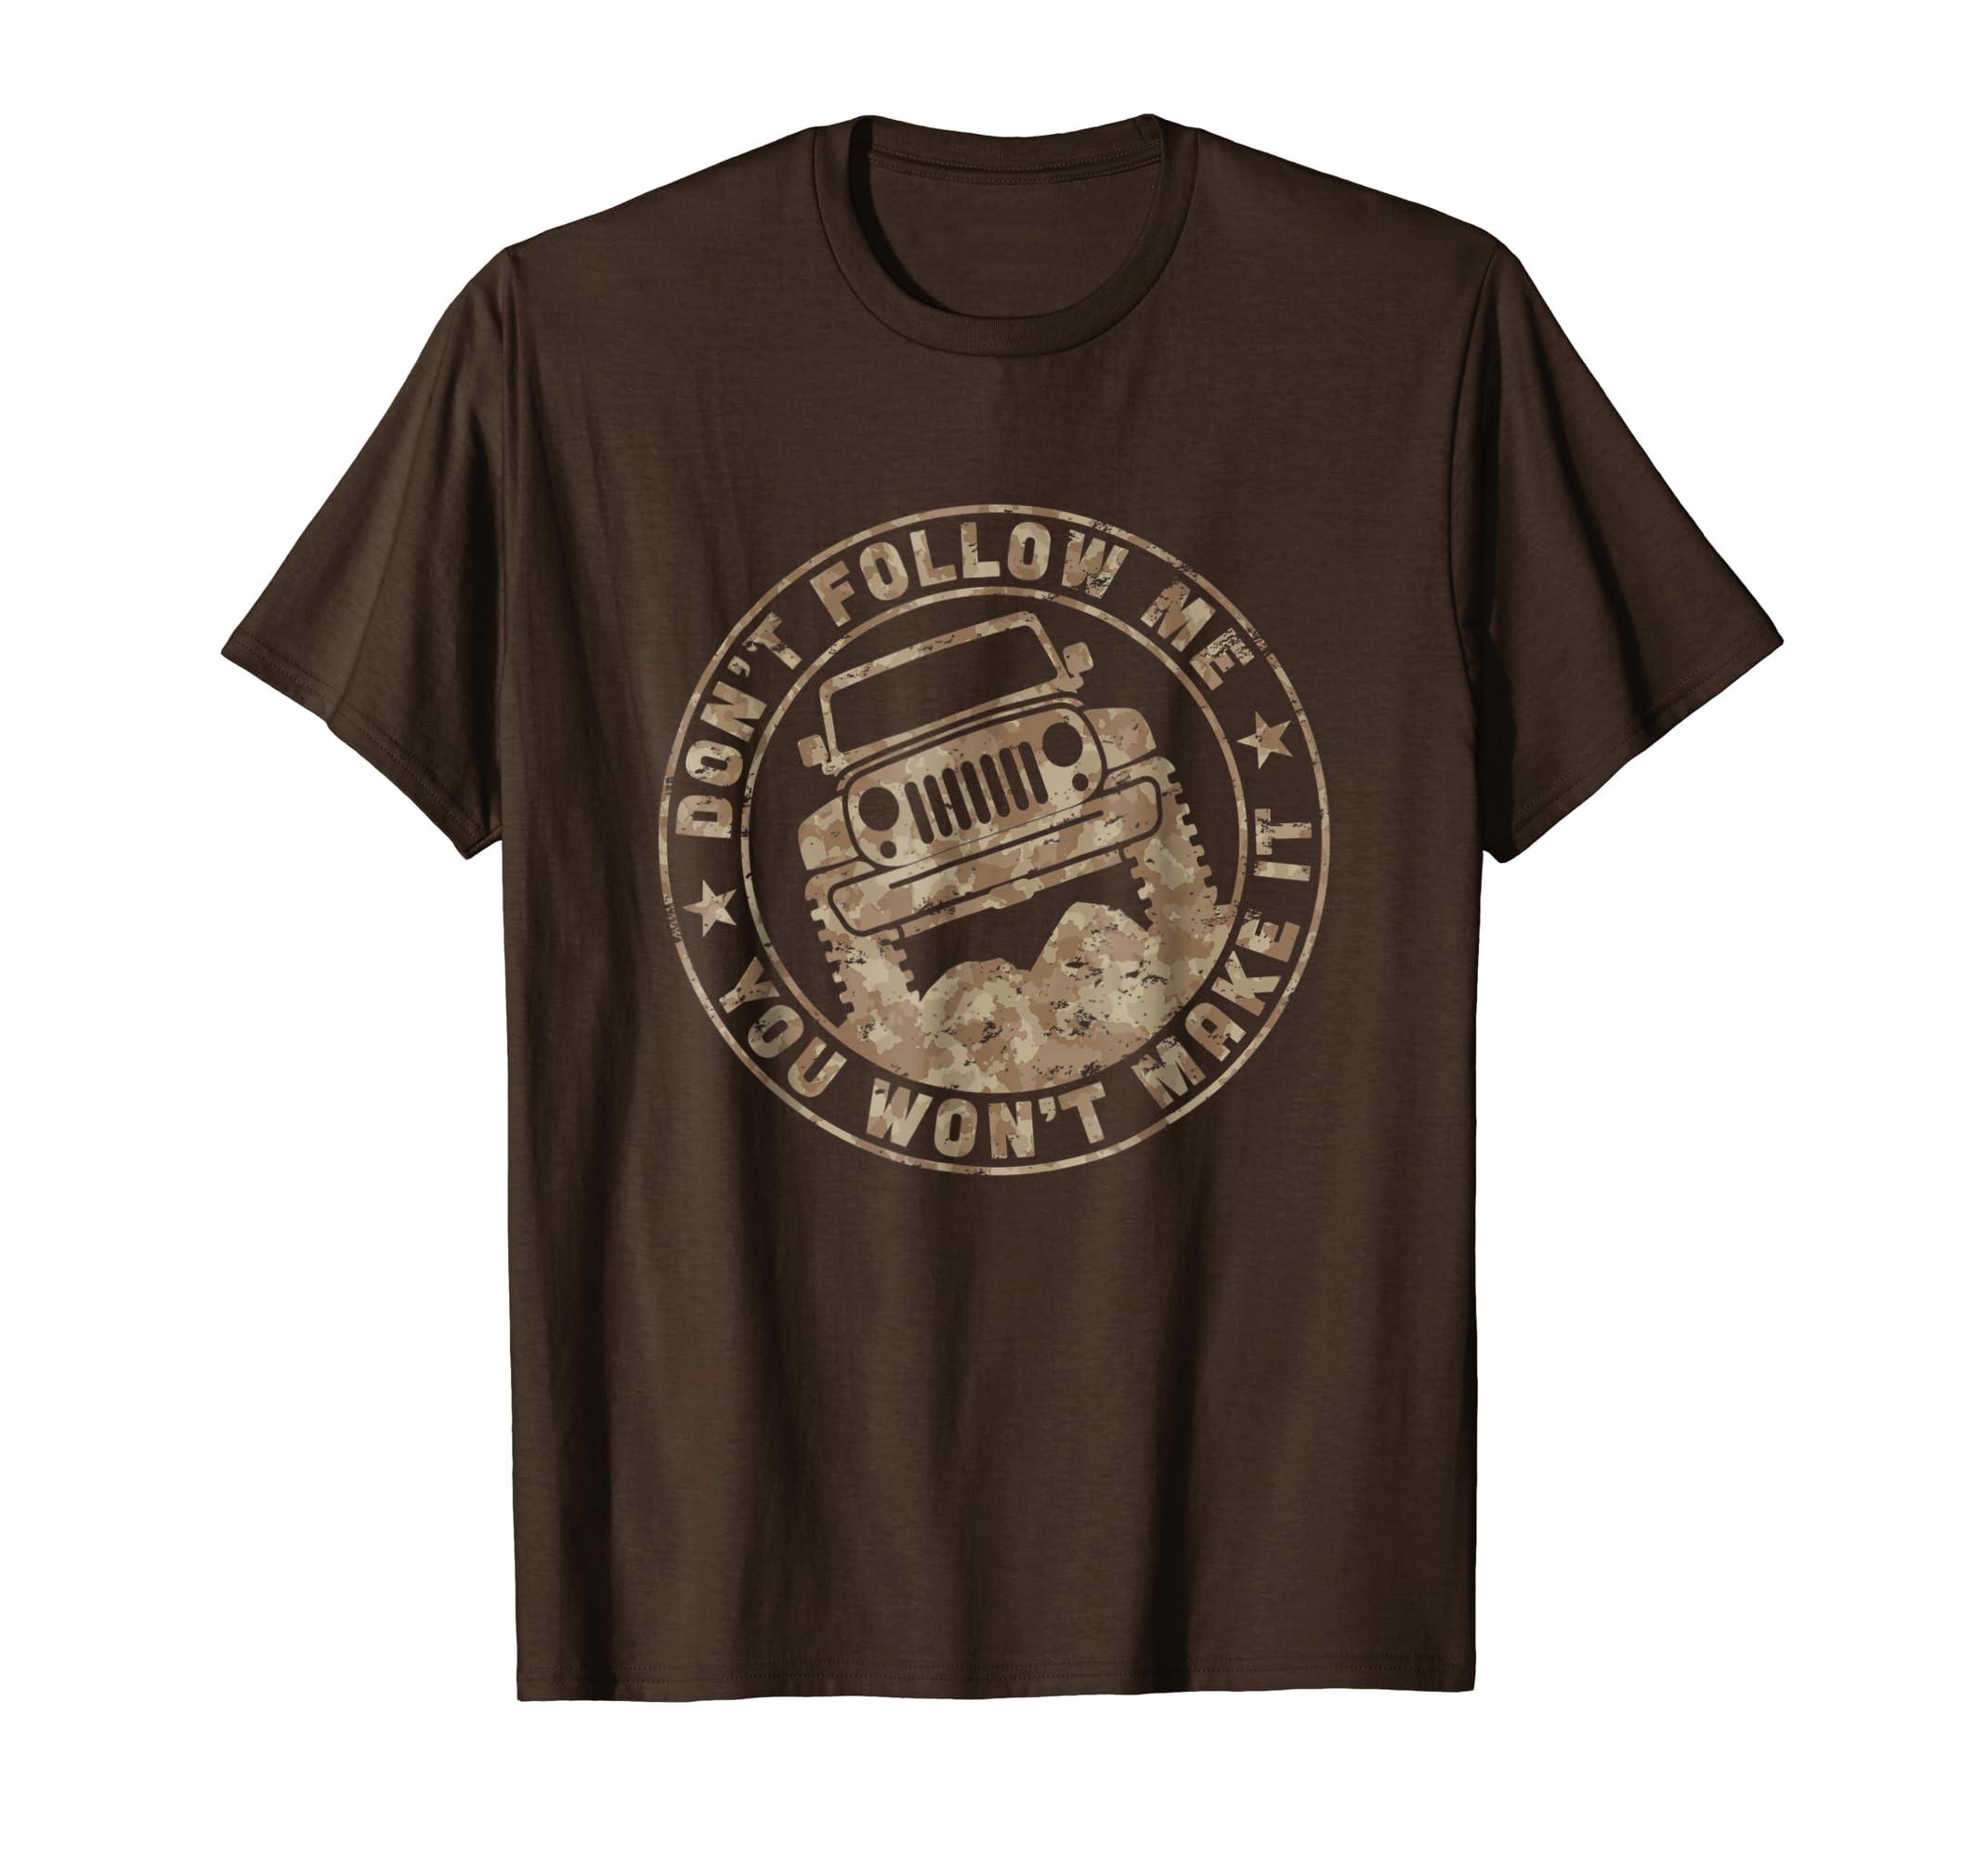 a5cfe438 Don't Follow Me You Won't Make It Jeep Camouflage T-Shirt-fa — Kuxovo